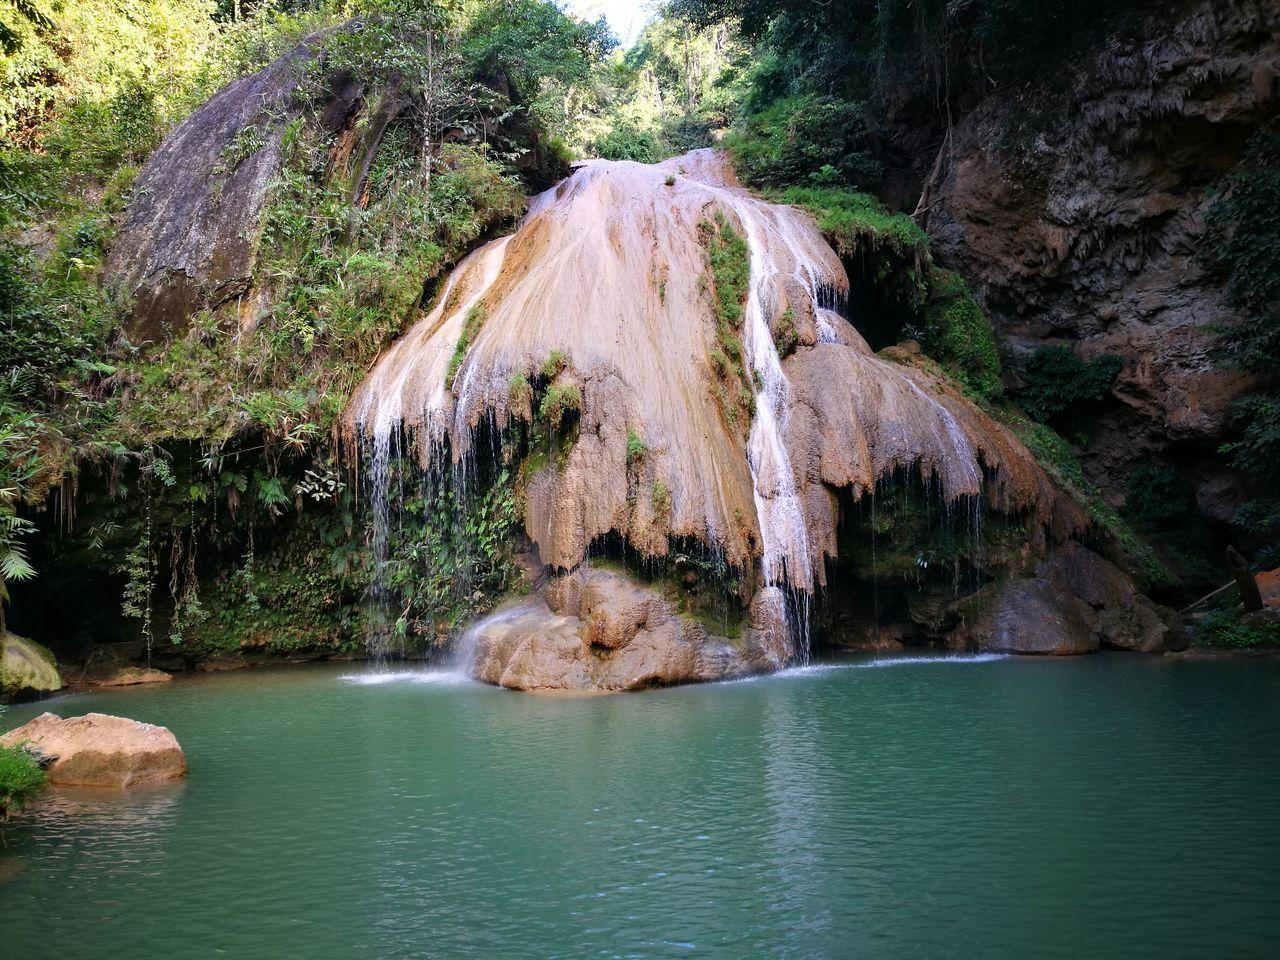 Water Nature Waterfalls💦 WaterfallInTheMountains Waterfall_collection waterfall #water #landscape nature beautiful